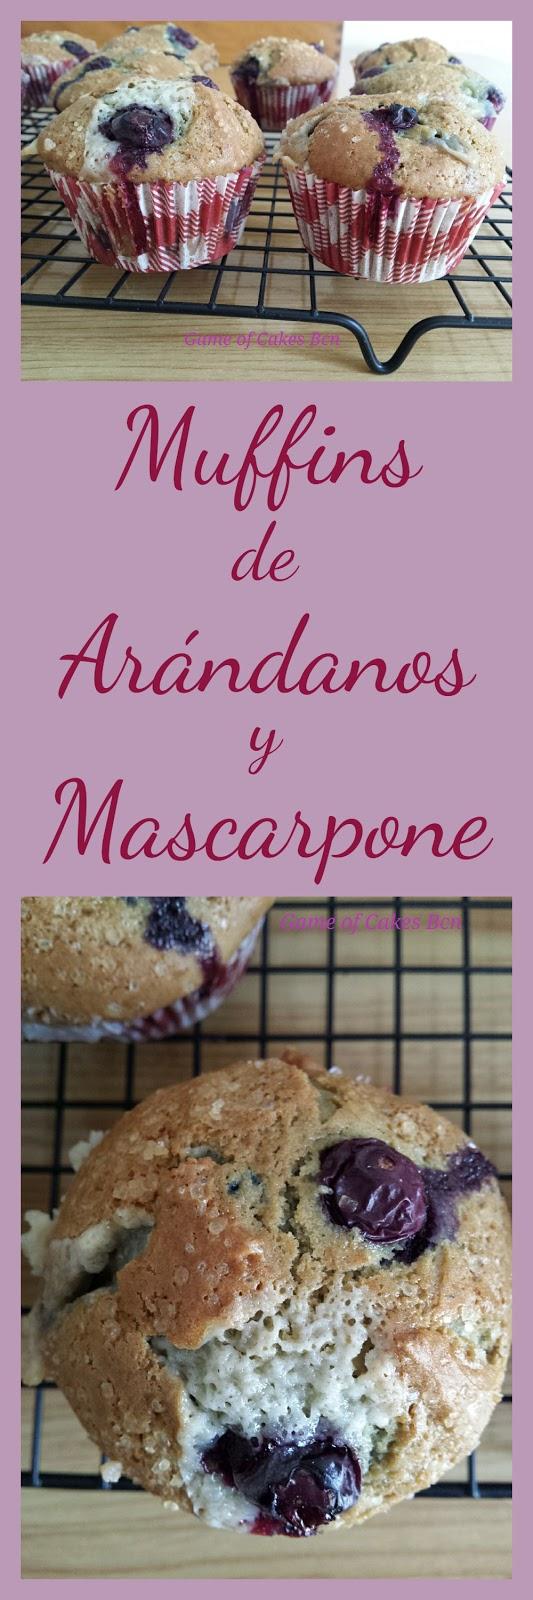 Muffins de arandanos y mascarpone game of cakes bcn